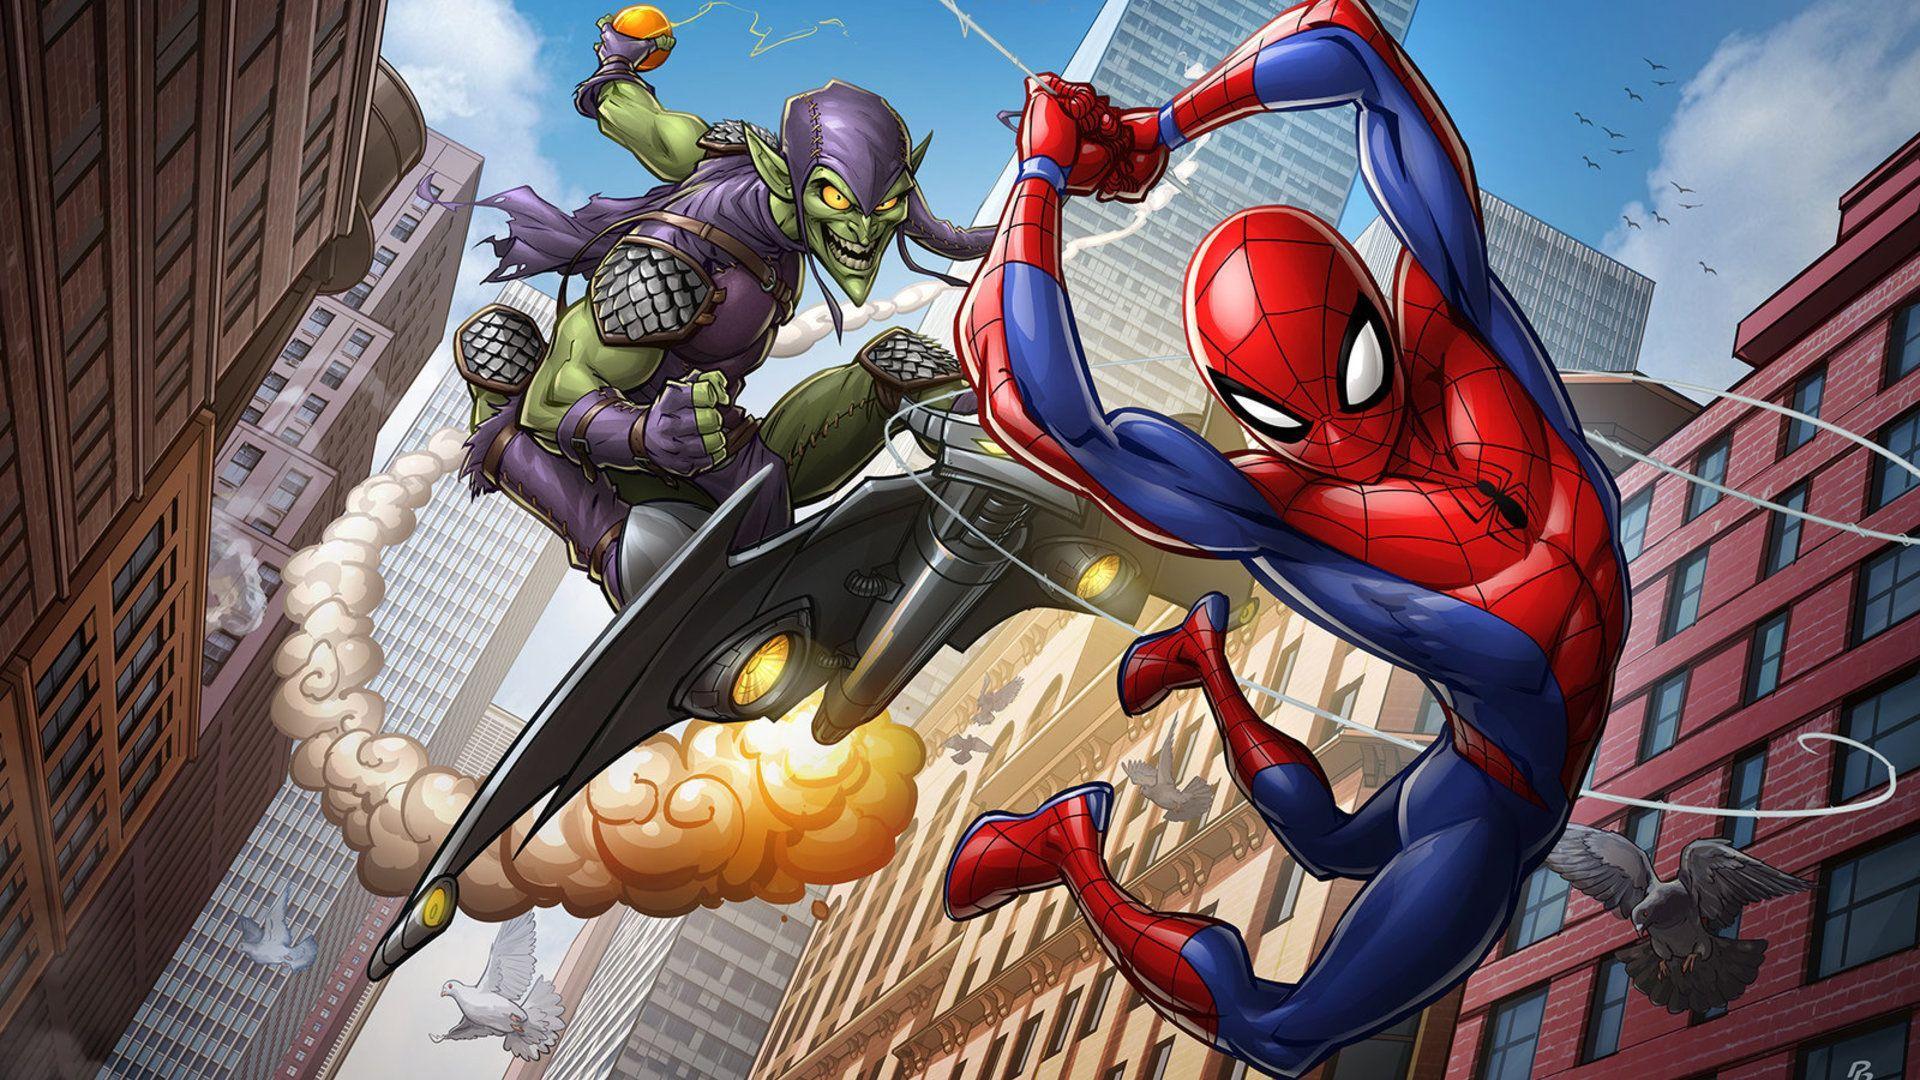 Spider-Man Cartoon HD Wallpapers - Wallpaper Cave